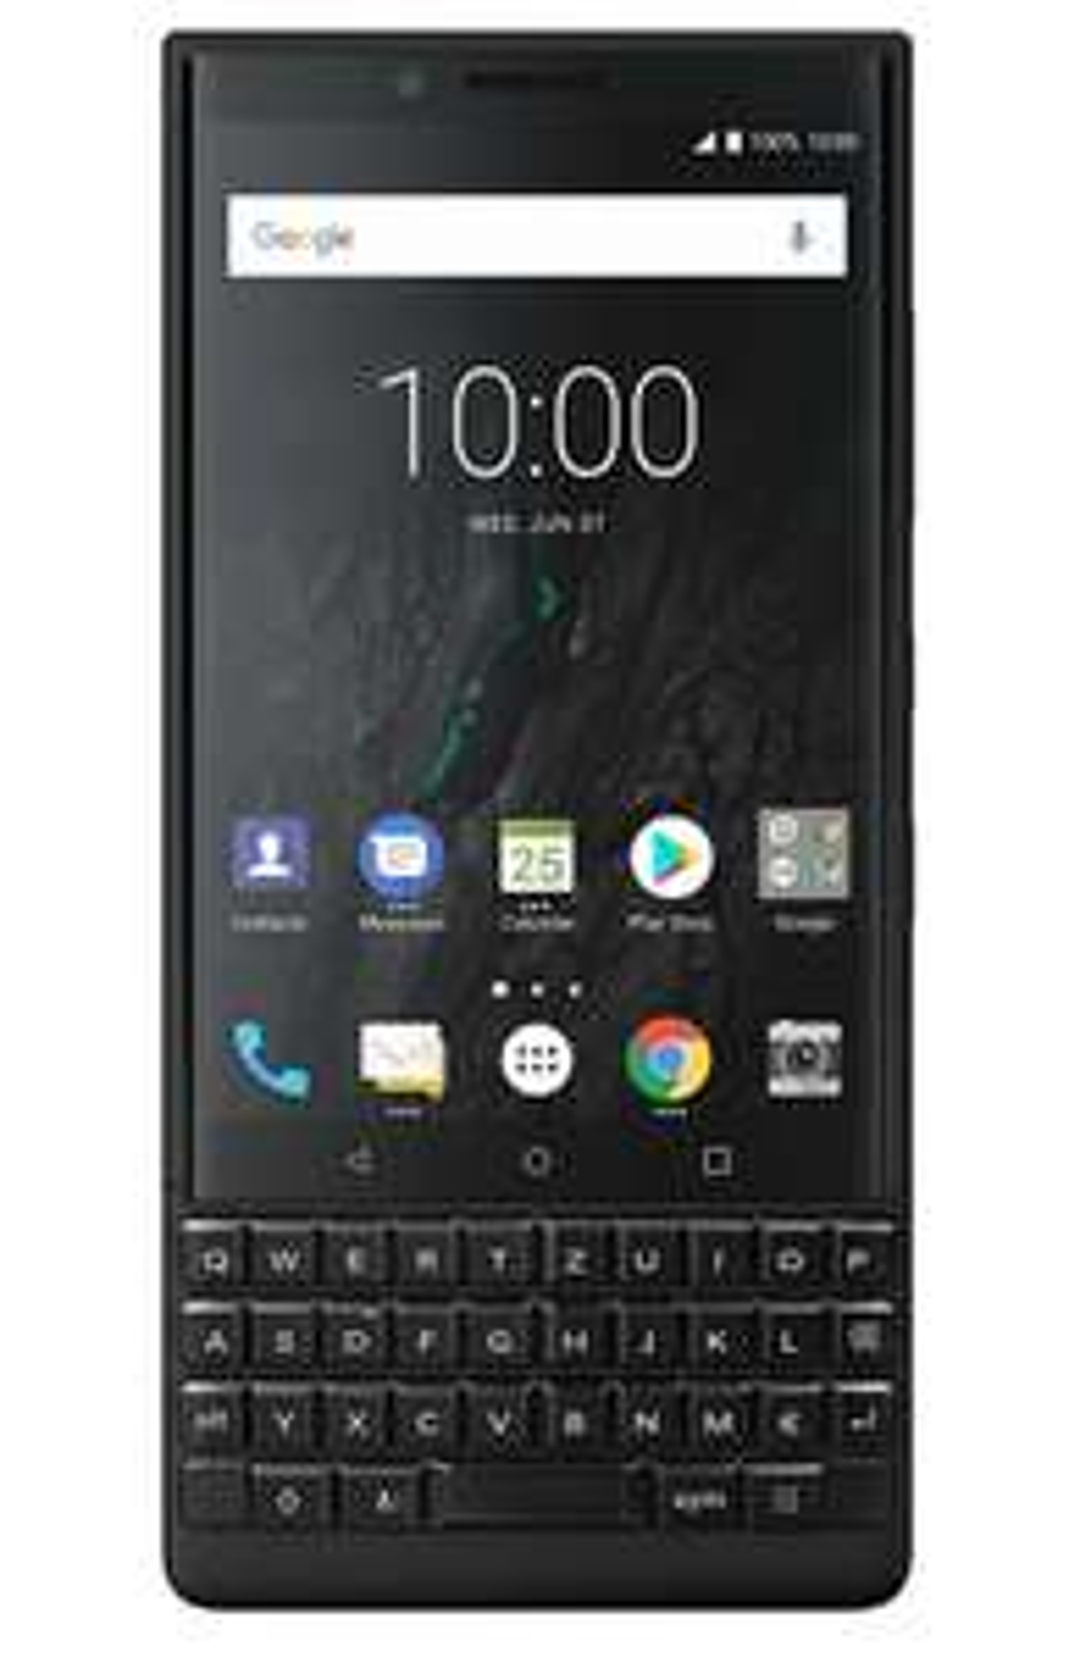 BlackBerry Key2 Dual Sim Smartphone 6/128 GB (4,5 Zoll Display, 12 Megapixel Kamera, LTE, Quick Charge 3.0, Android 8.1 Oreo) Schwarz